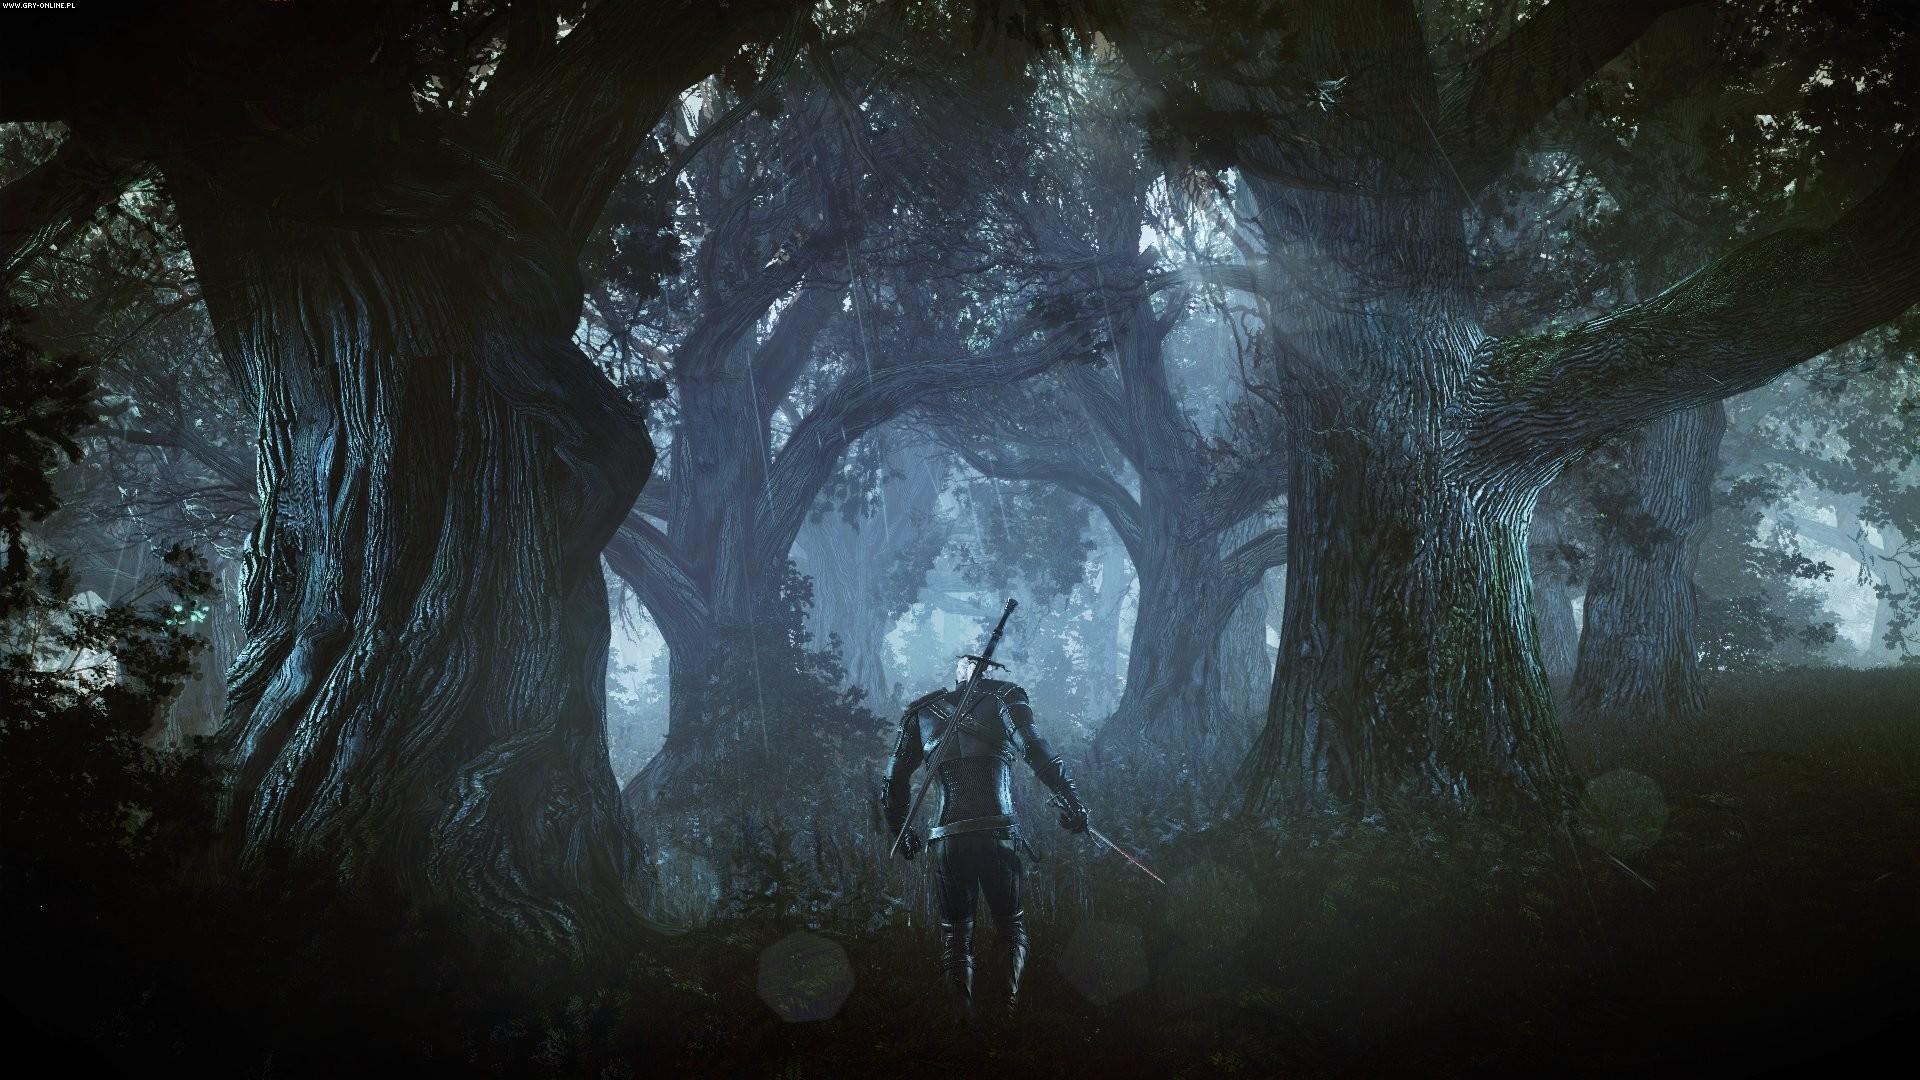 1920x1080 Video Game - The Witcher 3: Wild Hunt Video Game Dark Geralt of Rivia Wallpaper